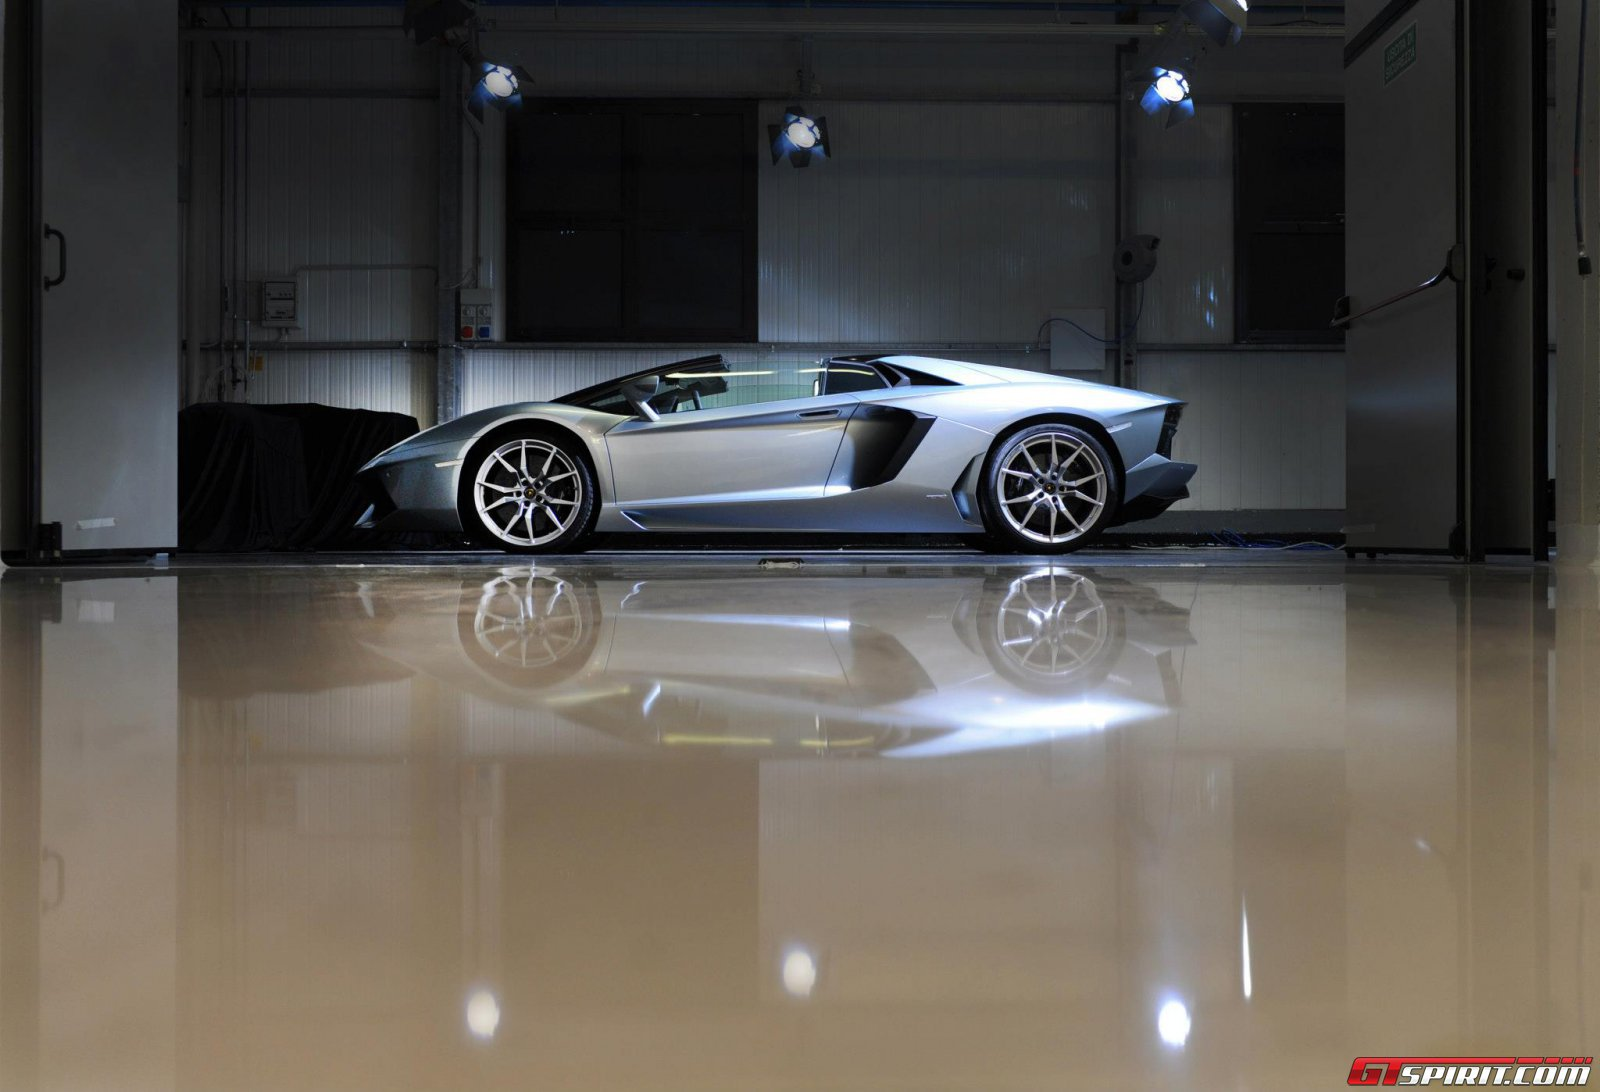 2013 Lamborghini Aventador LP700-4 Roadster Photo 18